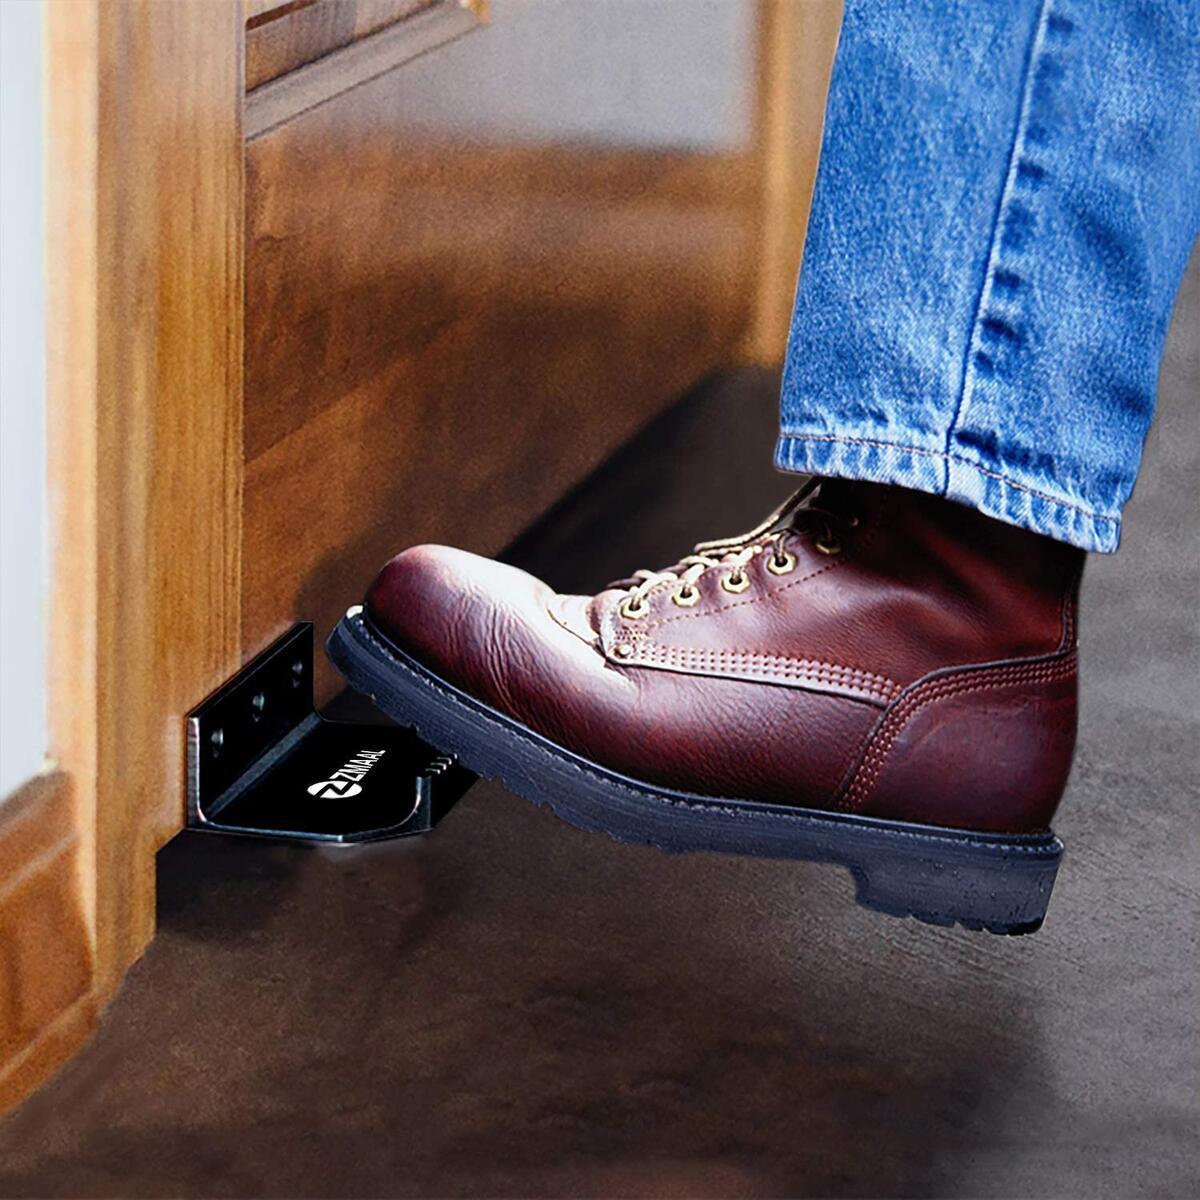 ZMAAL Hand Free Door Opener - touchless Foot or Toe Pull Opener for Drawer, Cabinet and Bathroom Doors (1, Black)